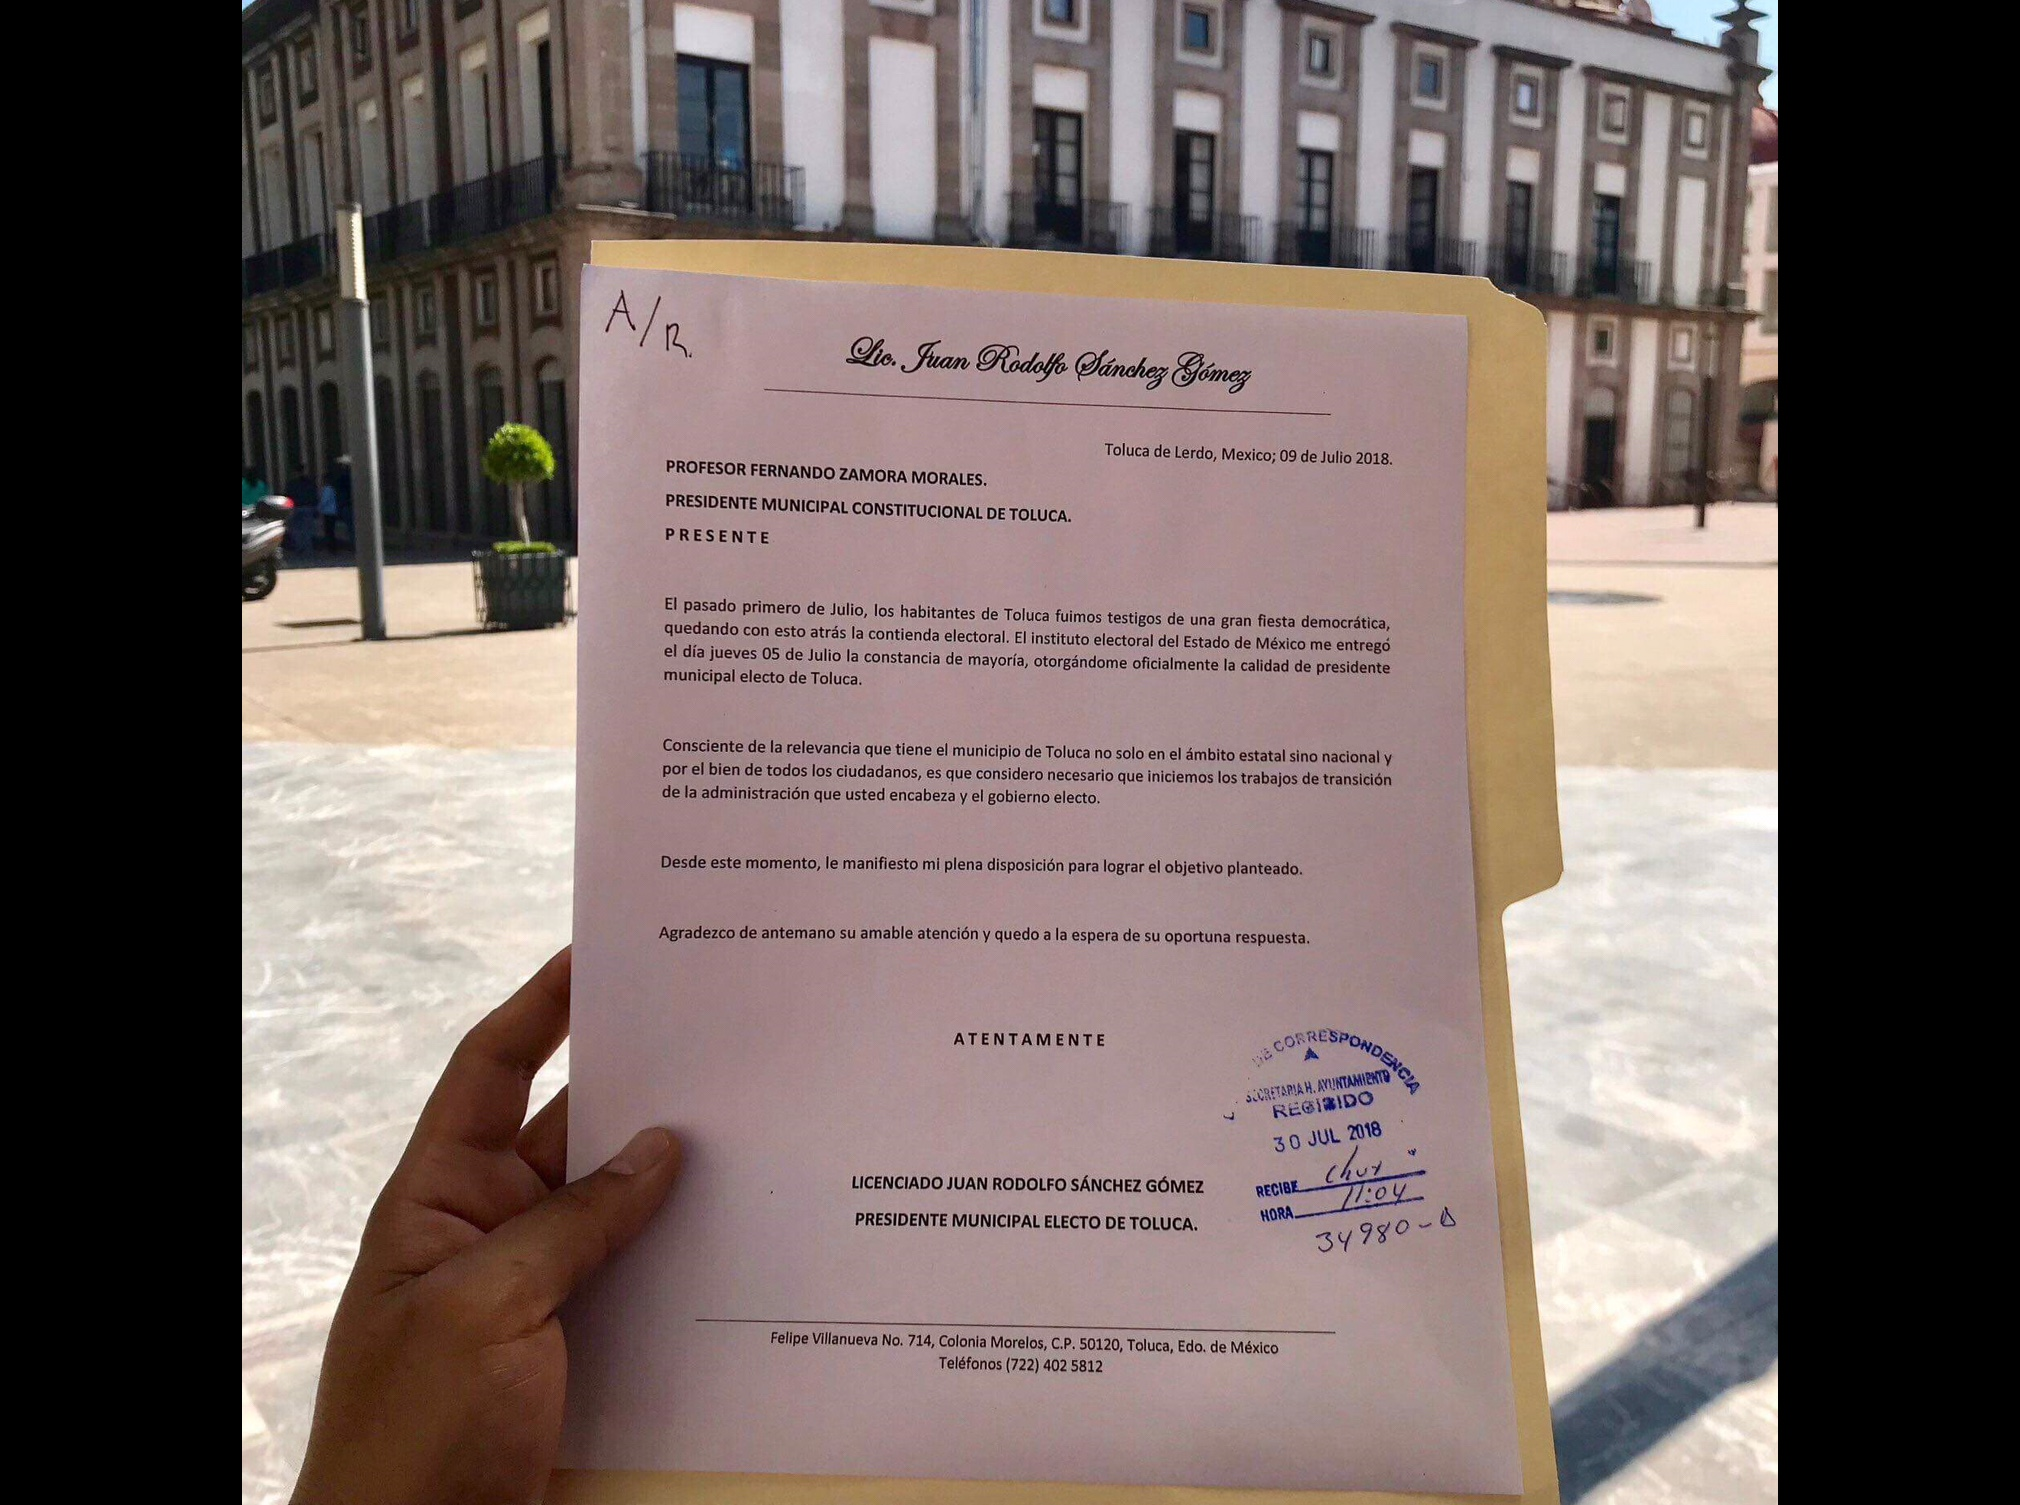 Aplica JuanRo sobremarcha a transición en Toluca